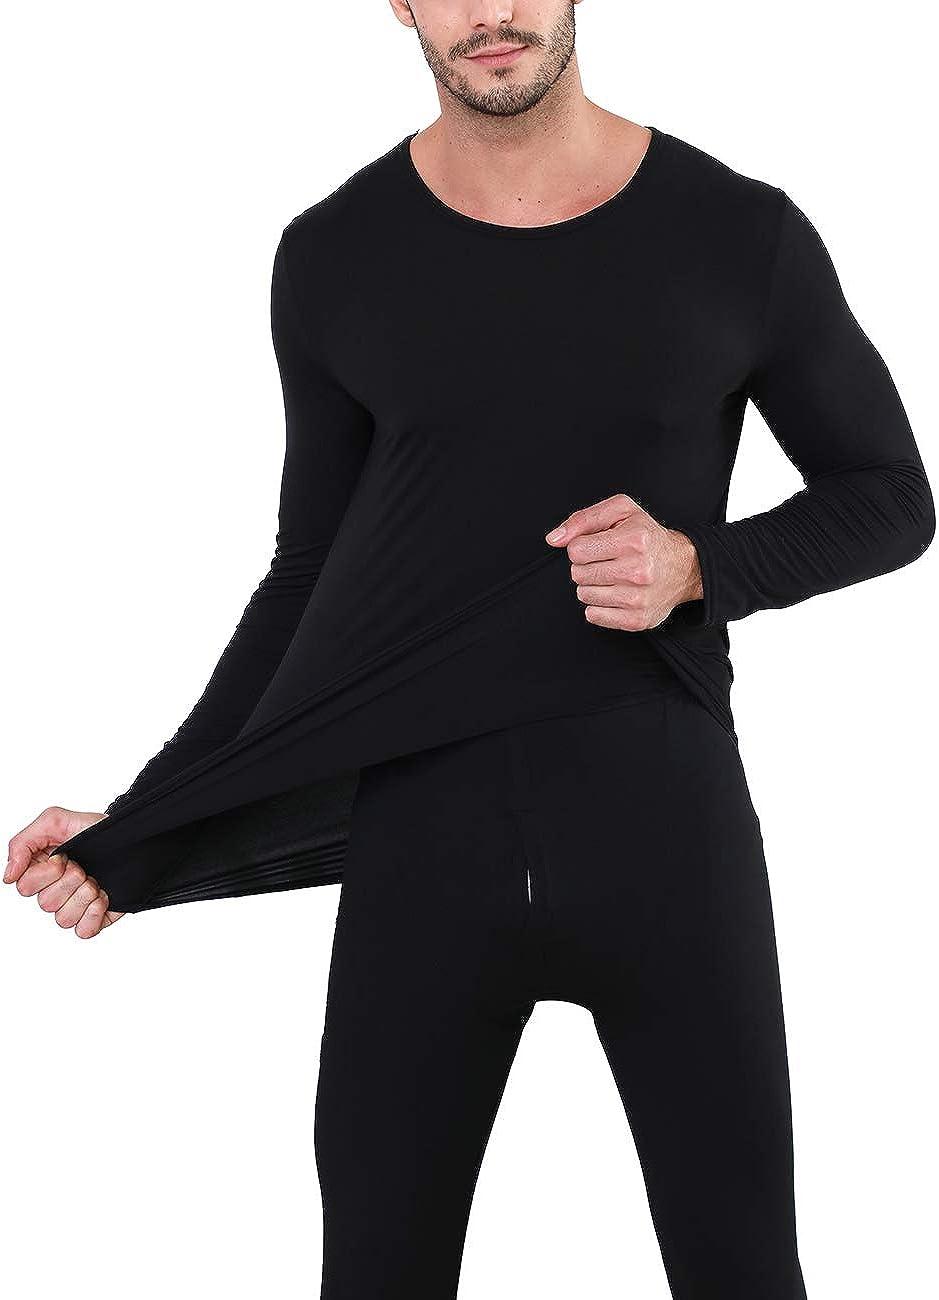 Nonbongoy Men's Ultra Soft Thermal Underwear Long Johns Top and Bottom Underwear Pajamas Set